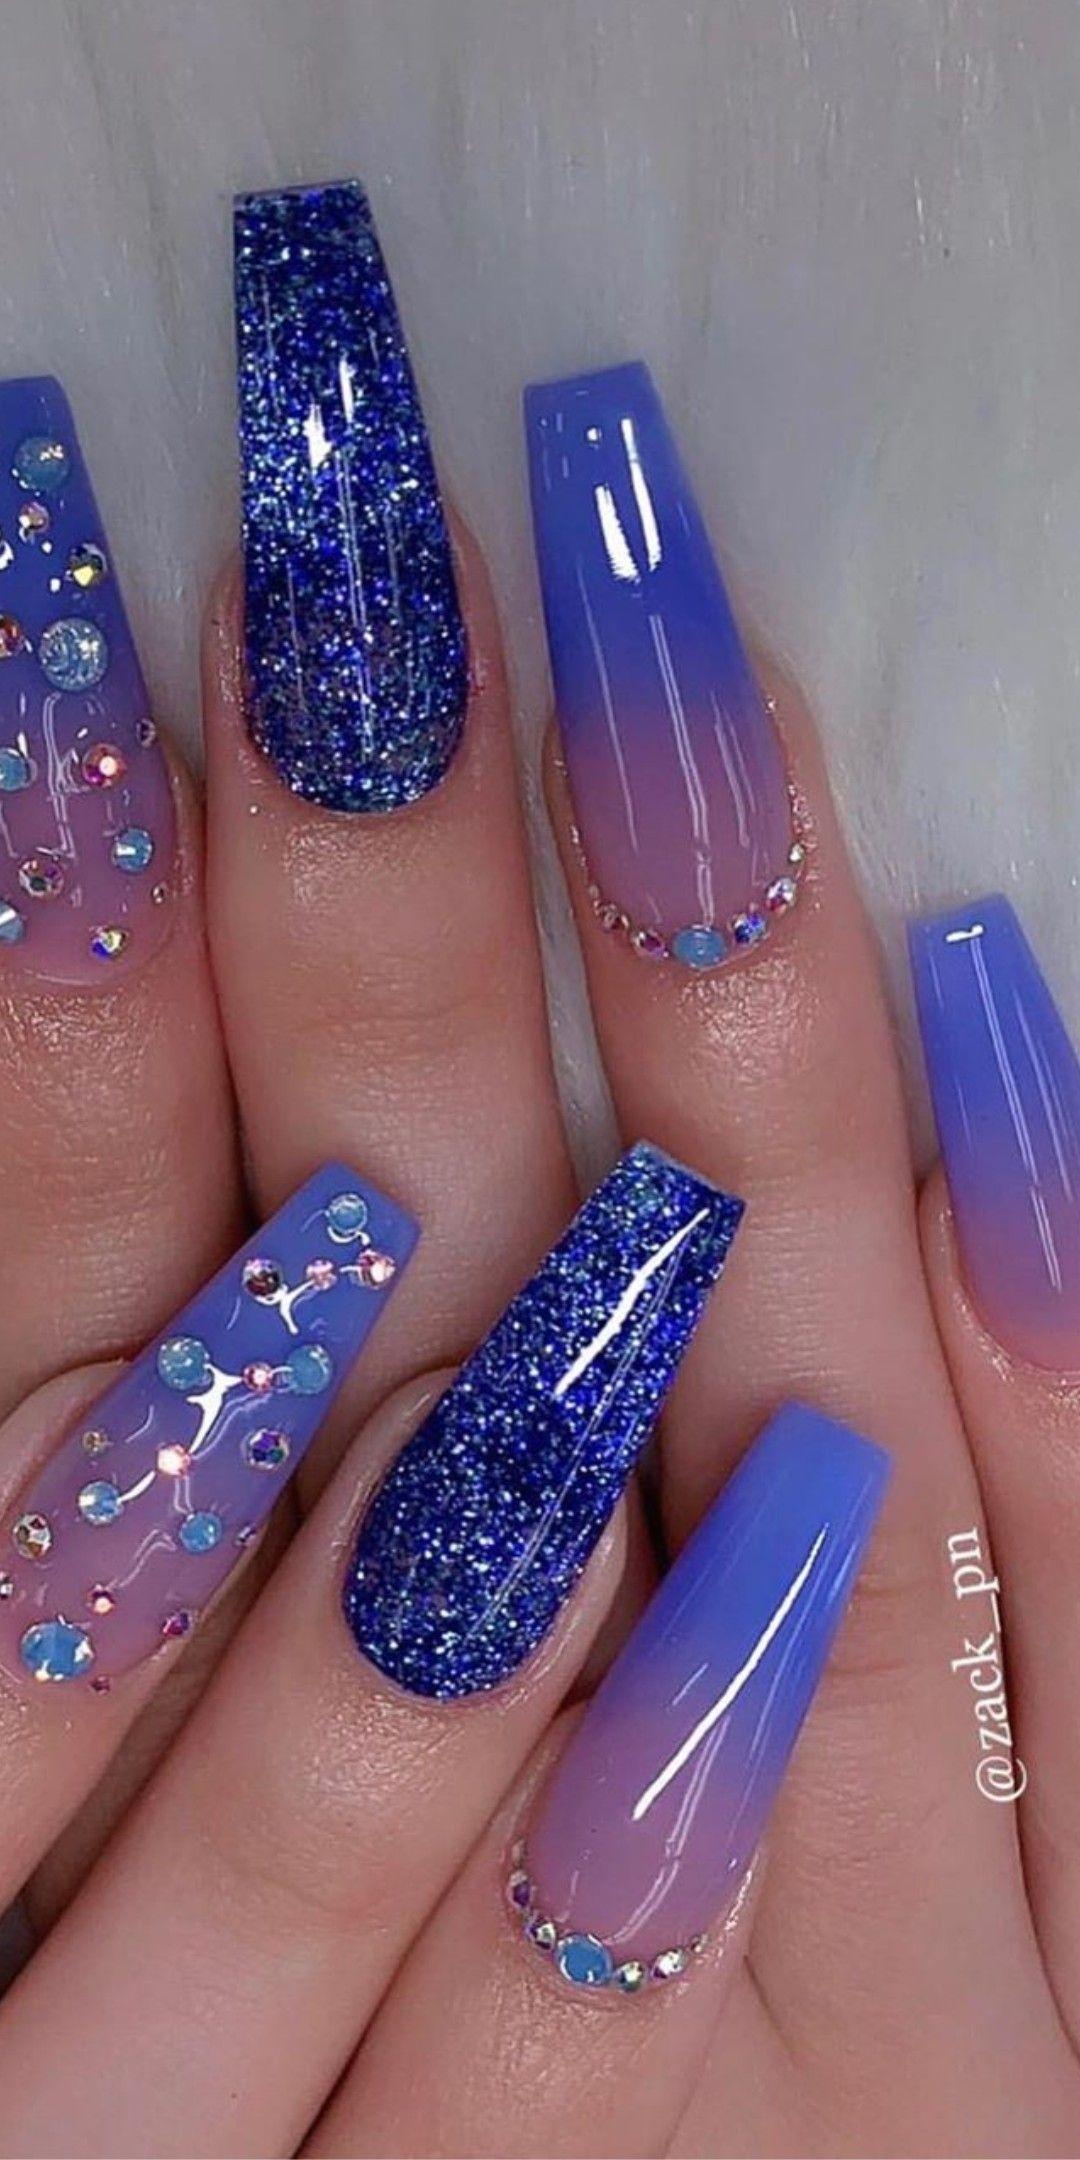 Stylish Gorgeous Glam Natural Nail Art Design Tutorial Polish Manicure Gel Painting Crea Stylish Nails Designs Blue Acrylic Nails Best Acrylic Nails